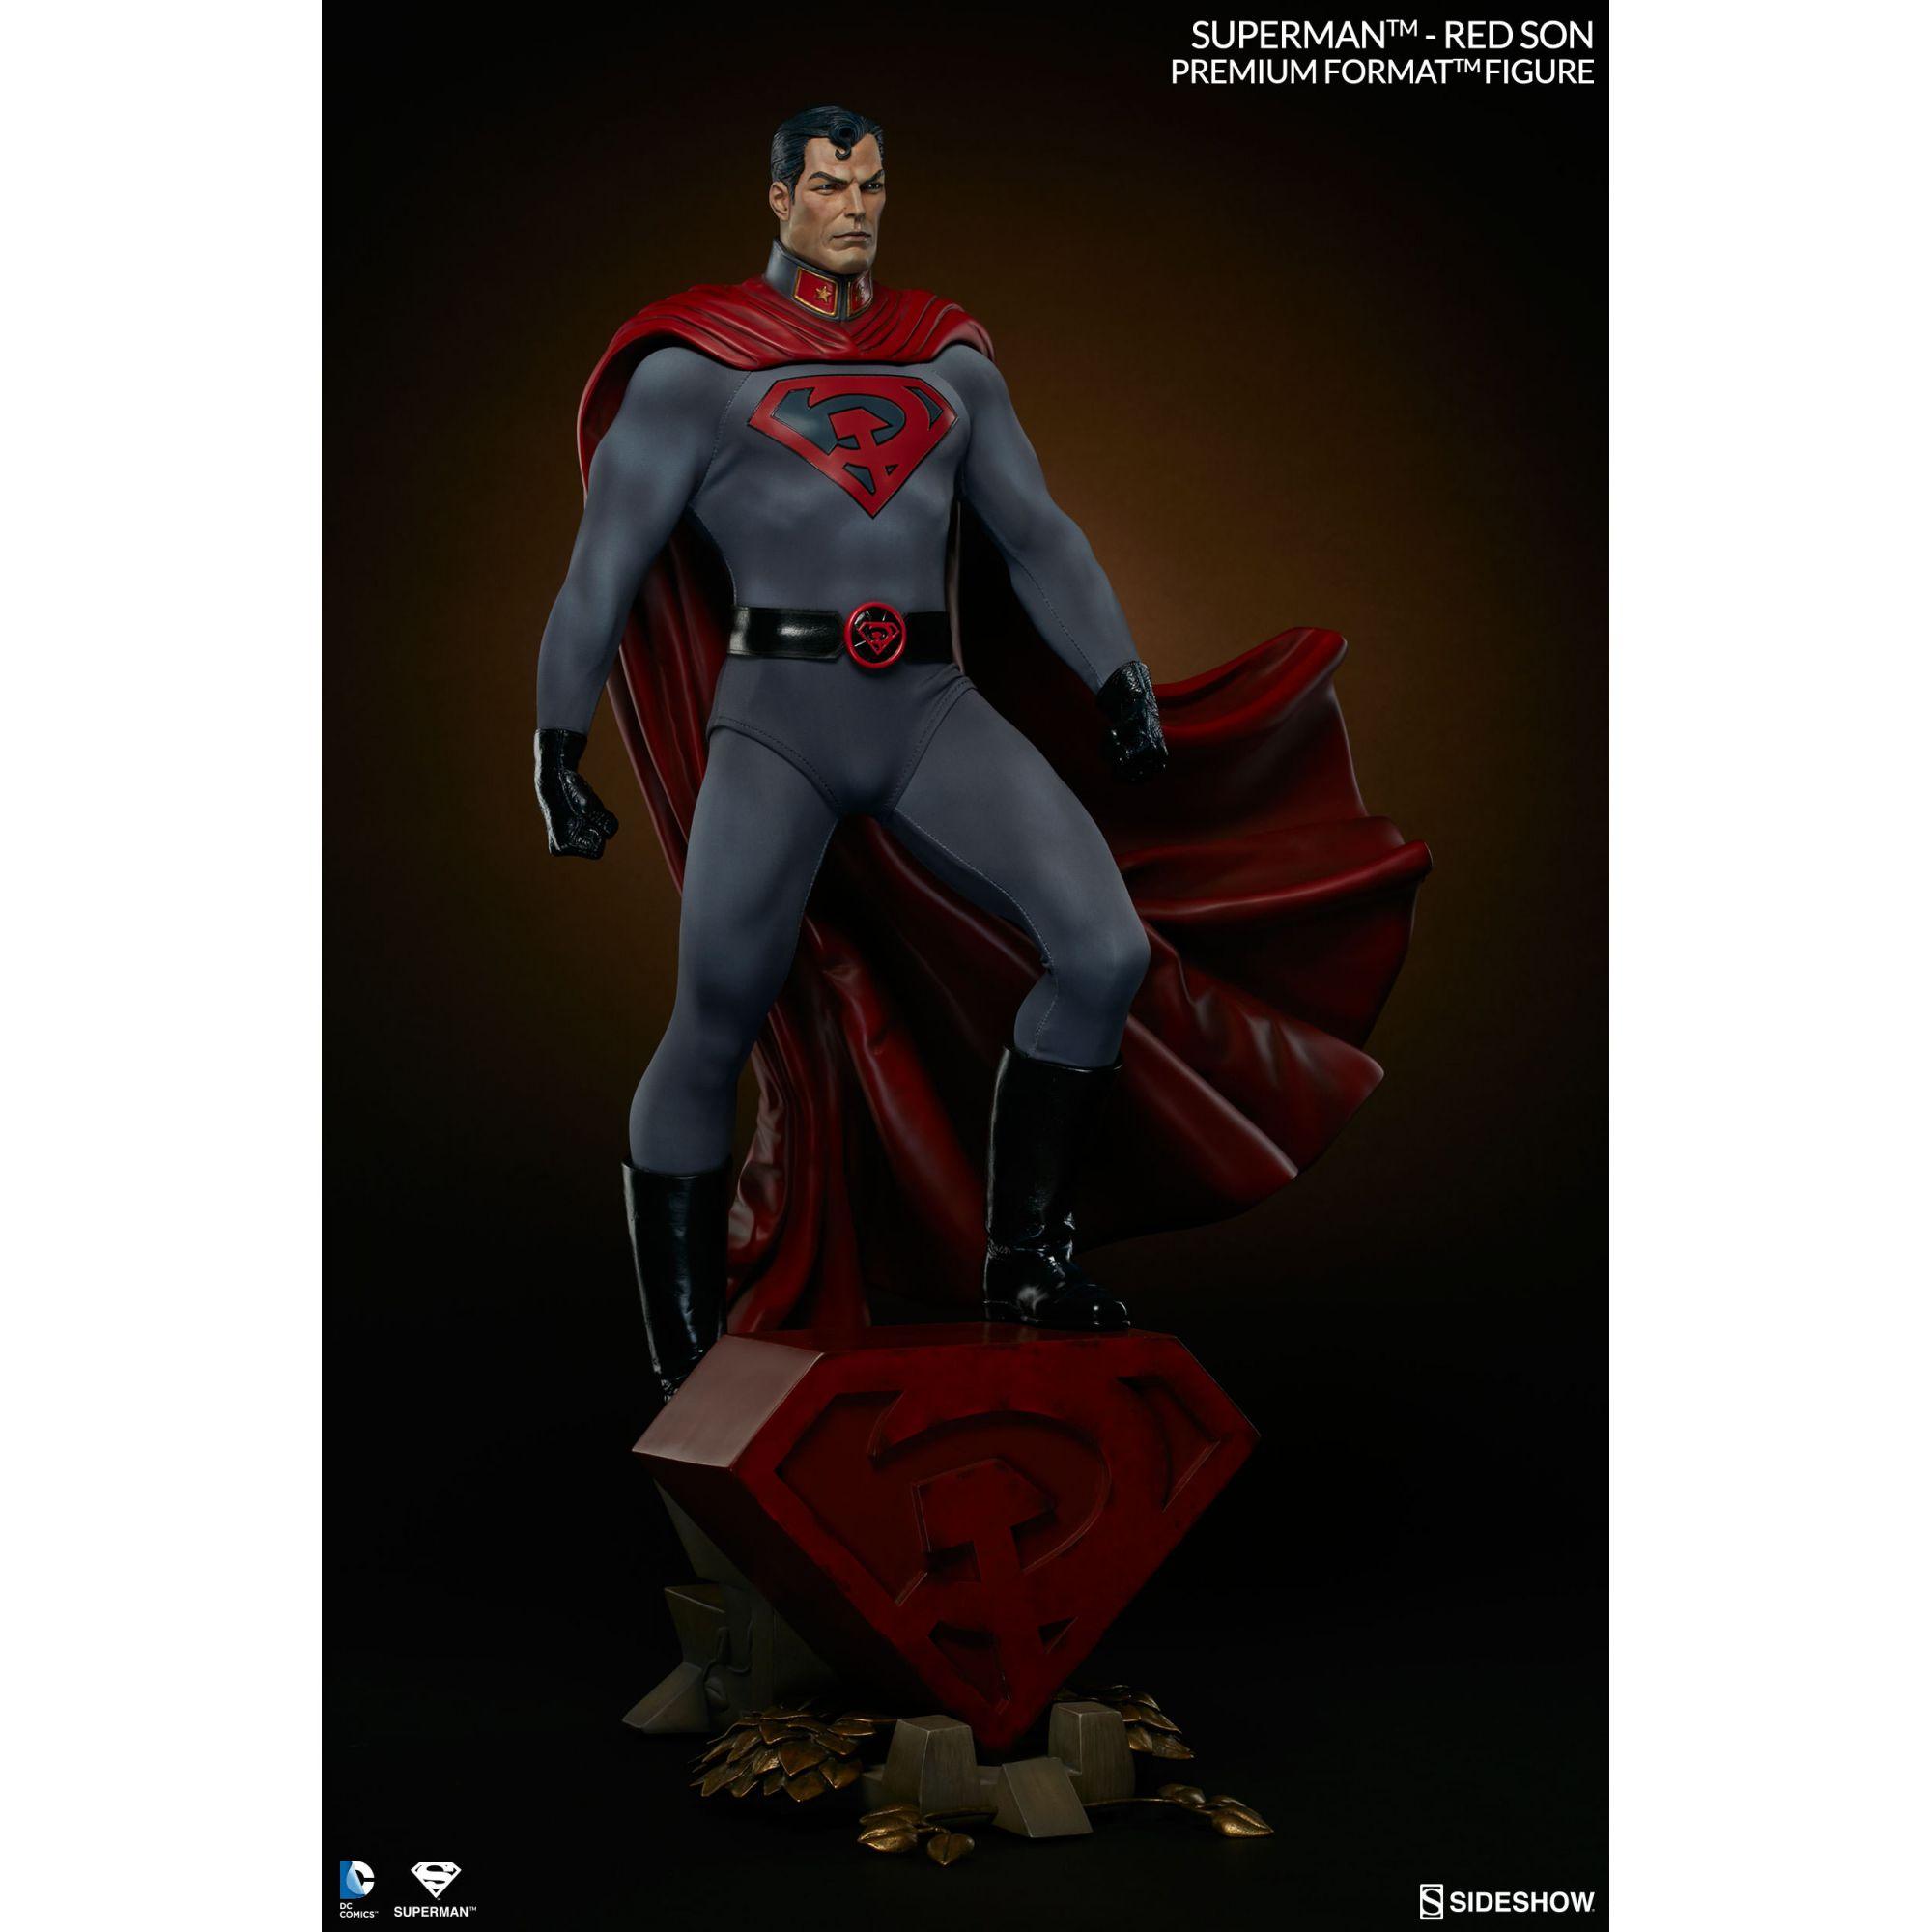 SIDESHOW SUPERMAN RED SON PREMIUM FORMAT SUPER MAN 1/4